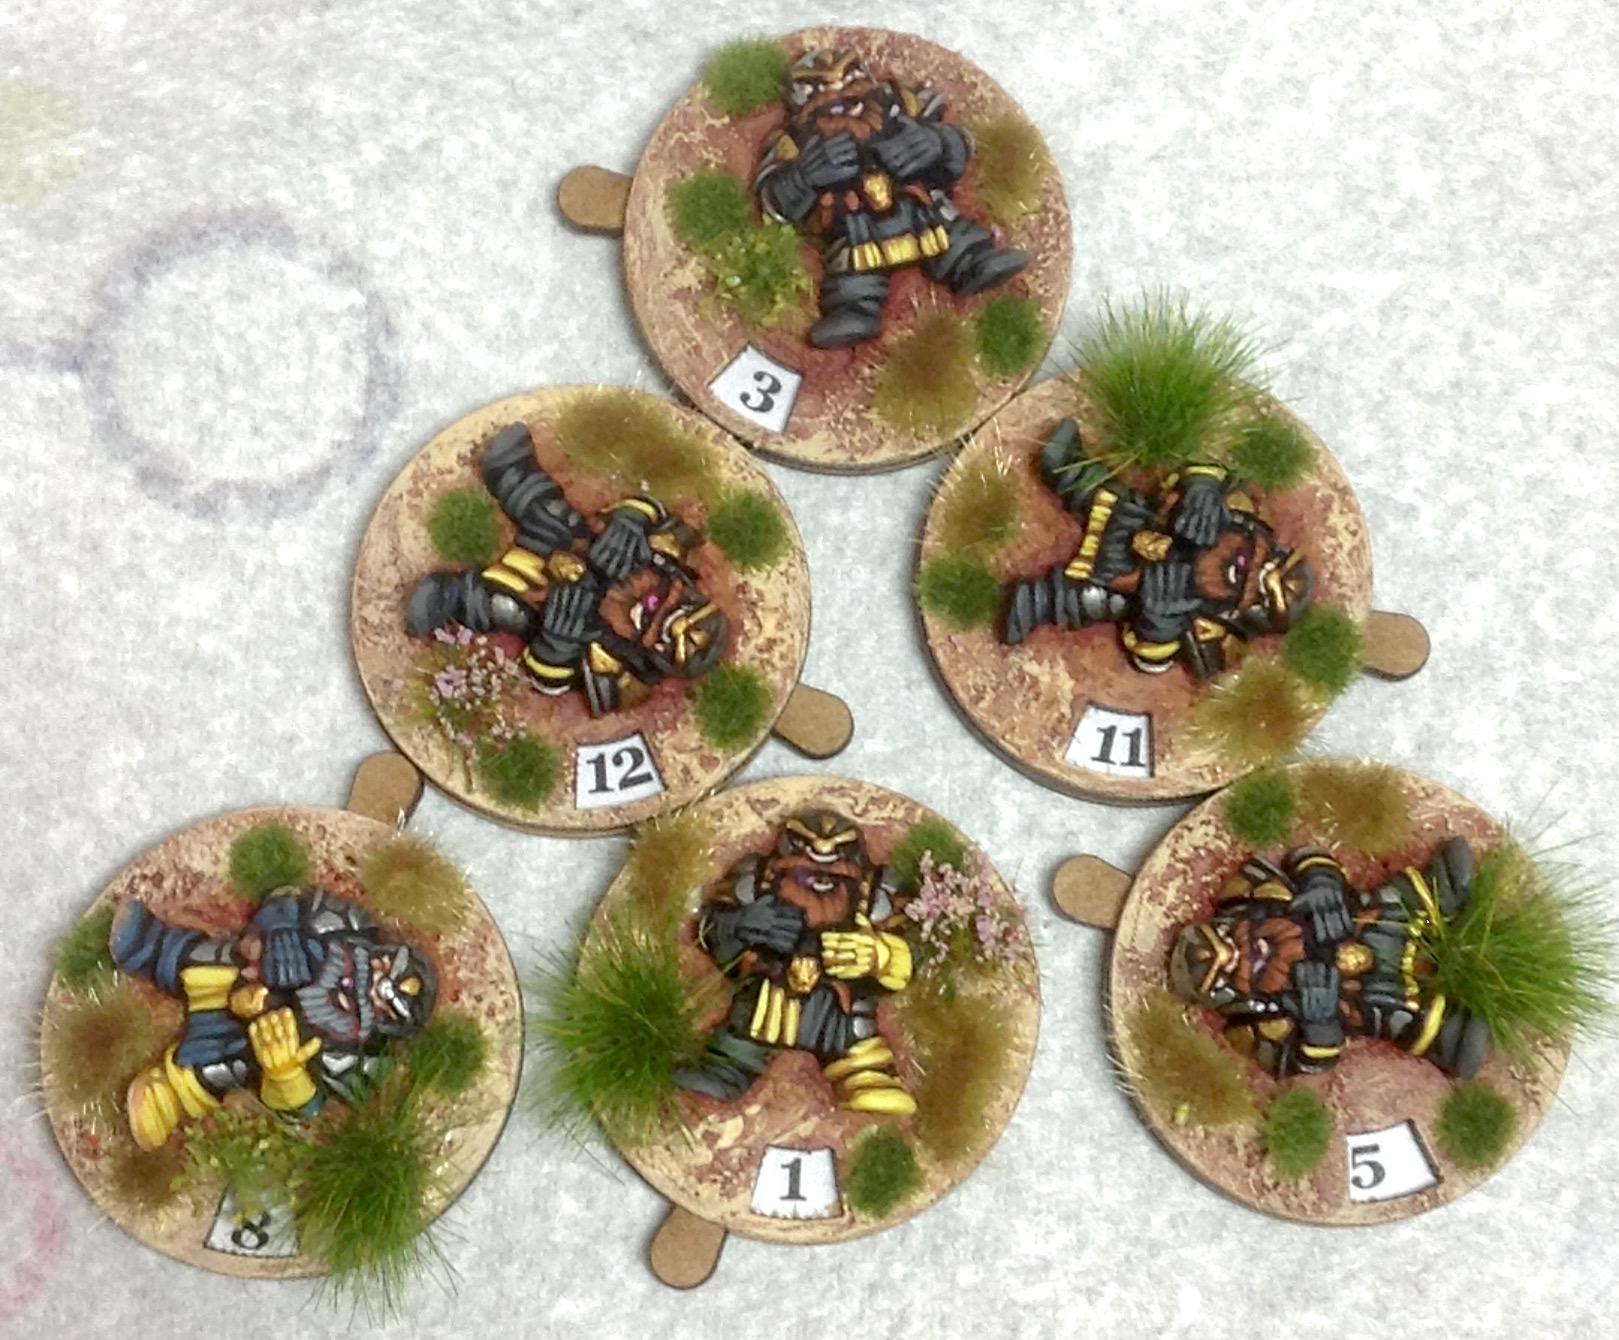 J Cockburn - Casualty Marker with Dwarfs